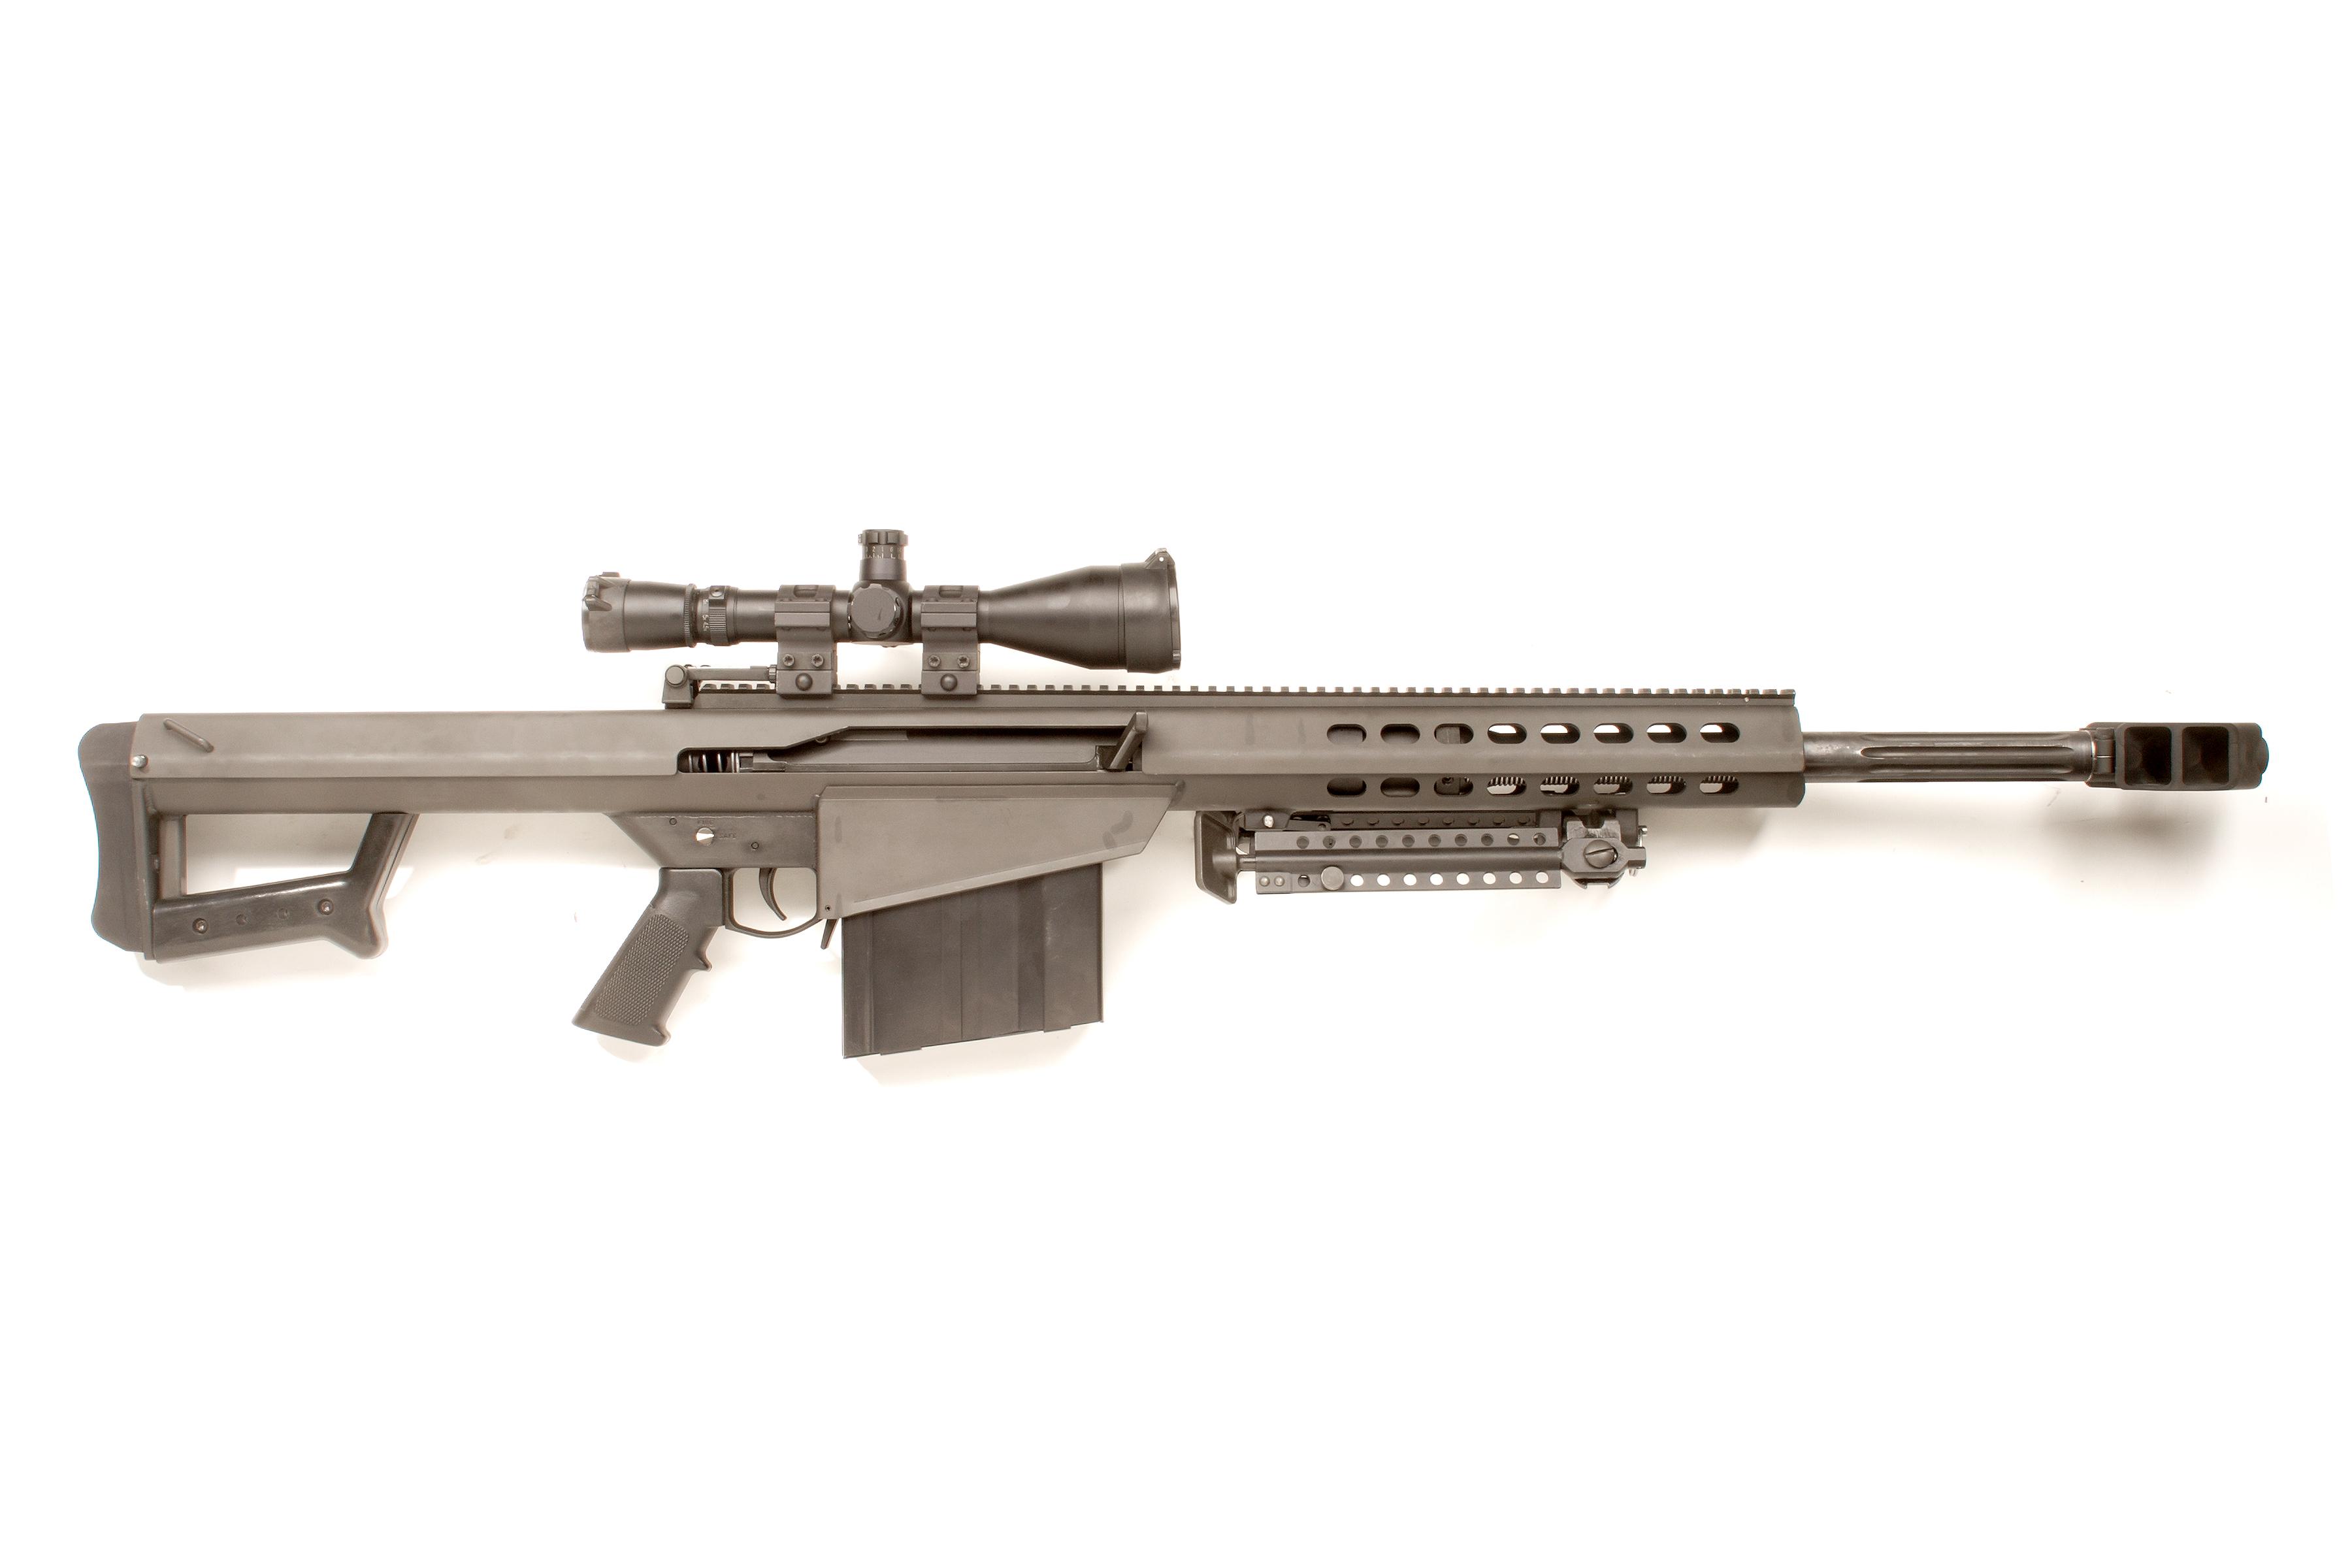 50 cal sniper rifle 50 cal sniper rifle